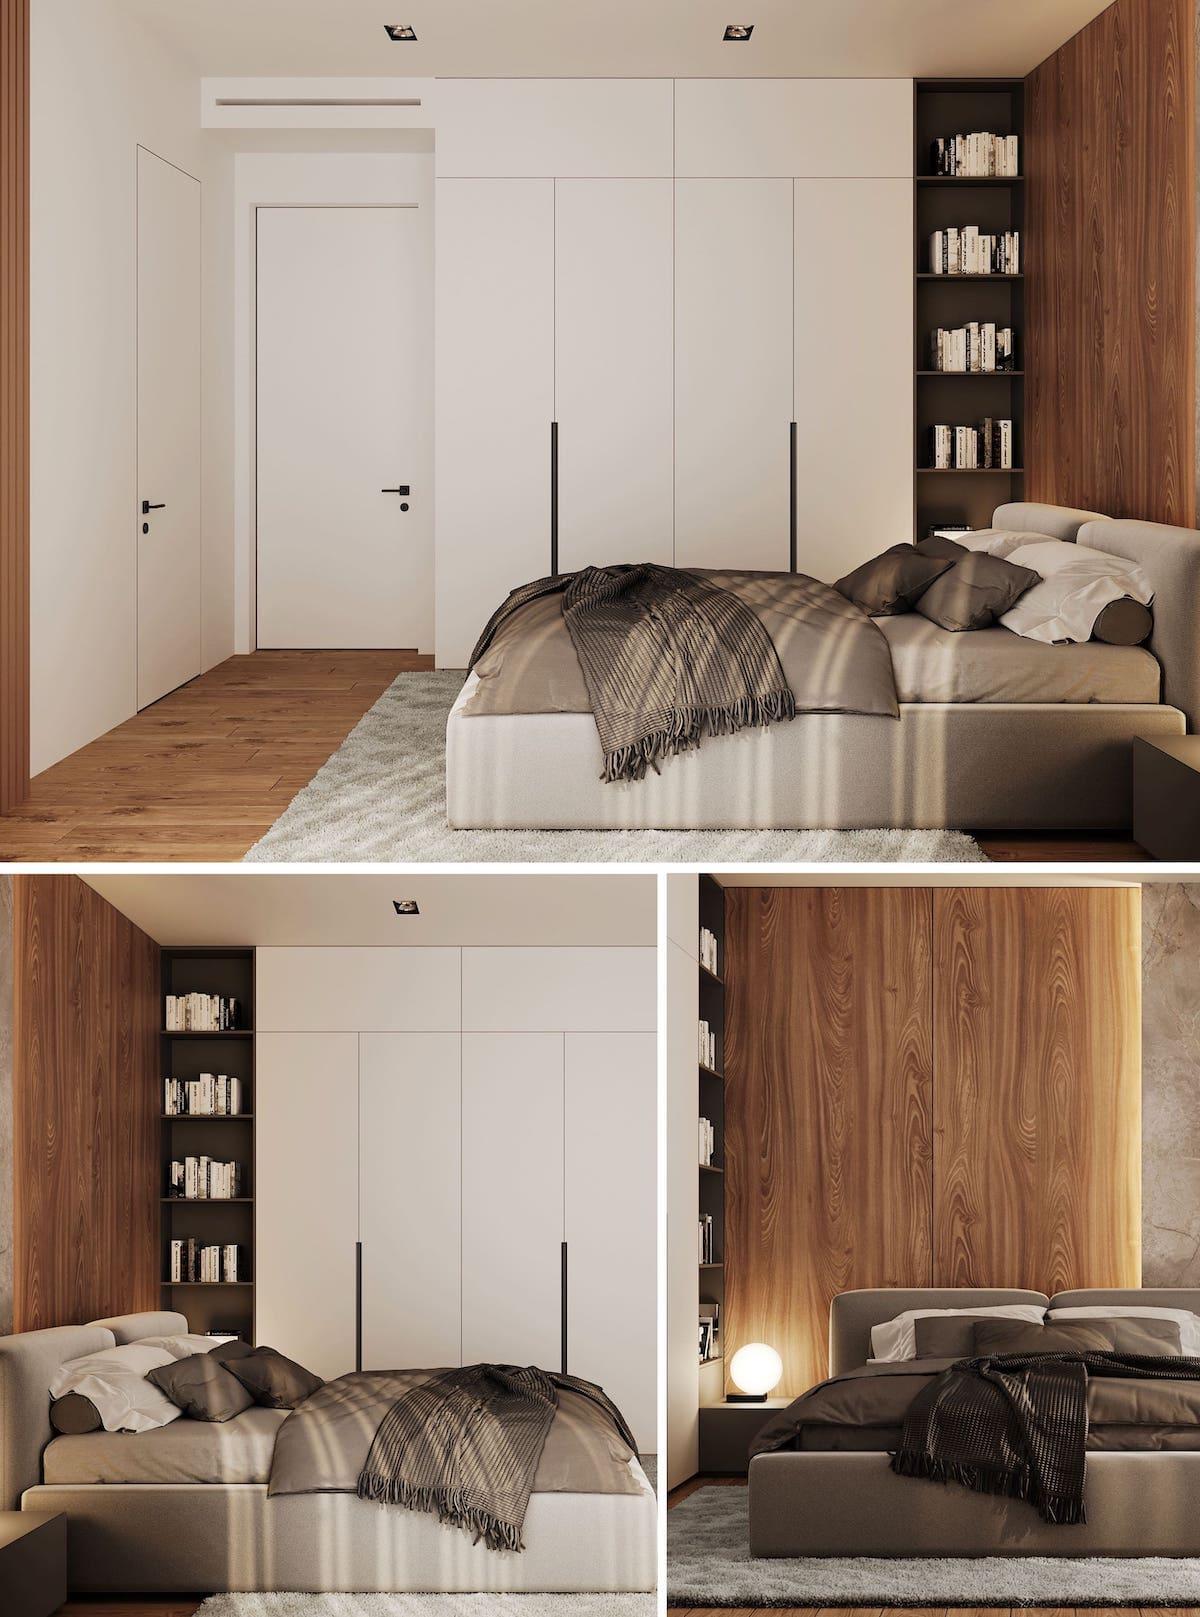 интерьер спальни фото 70